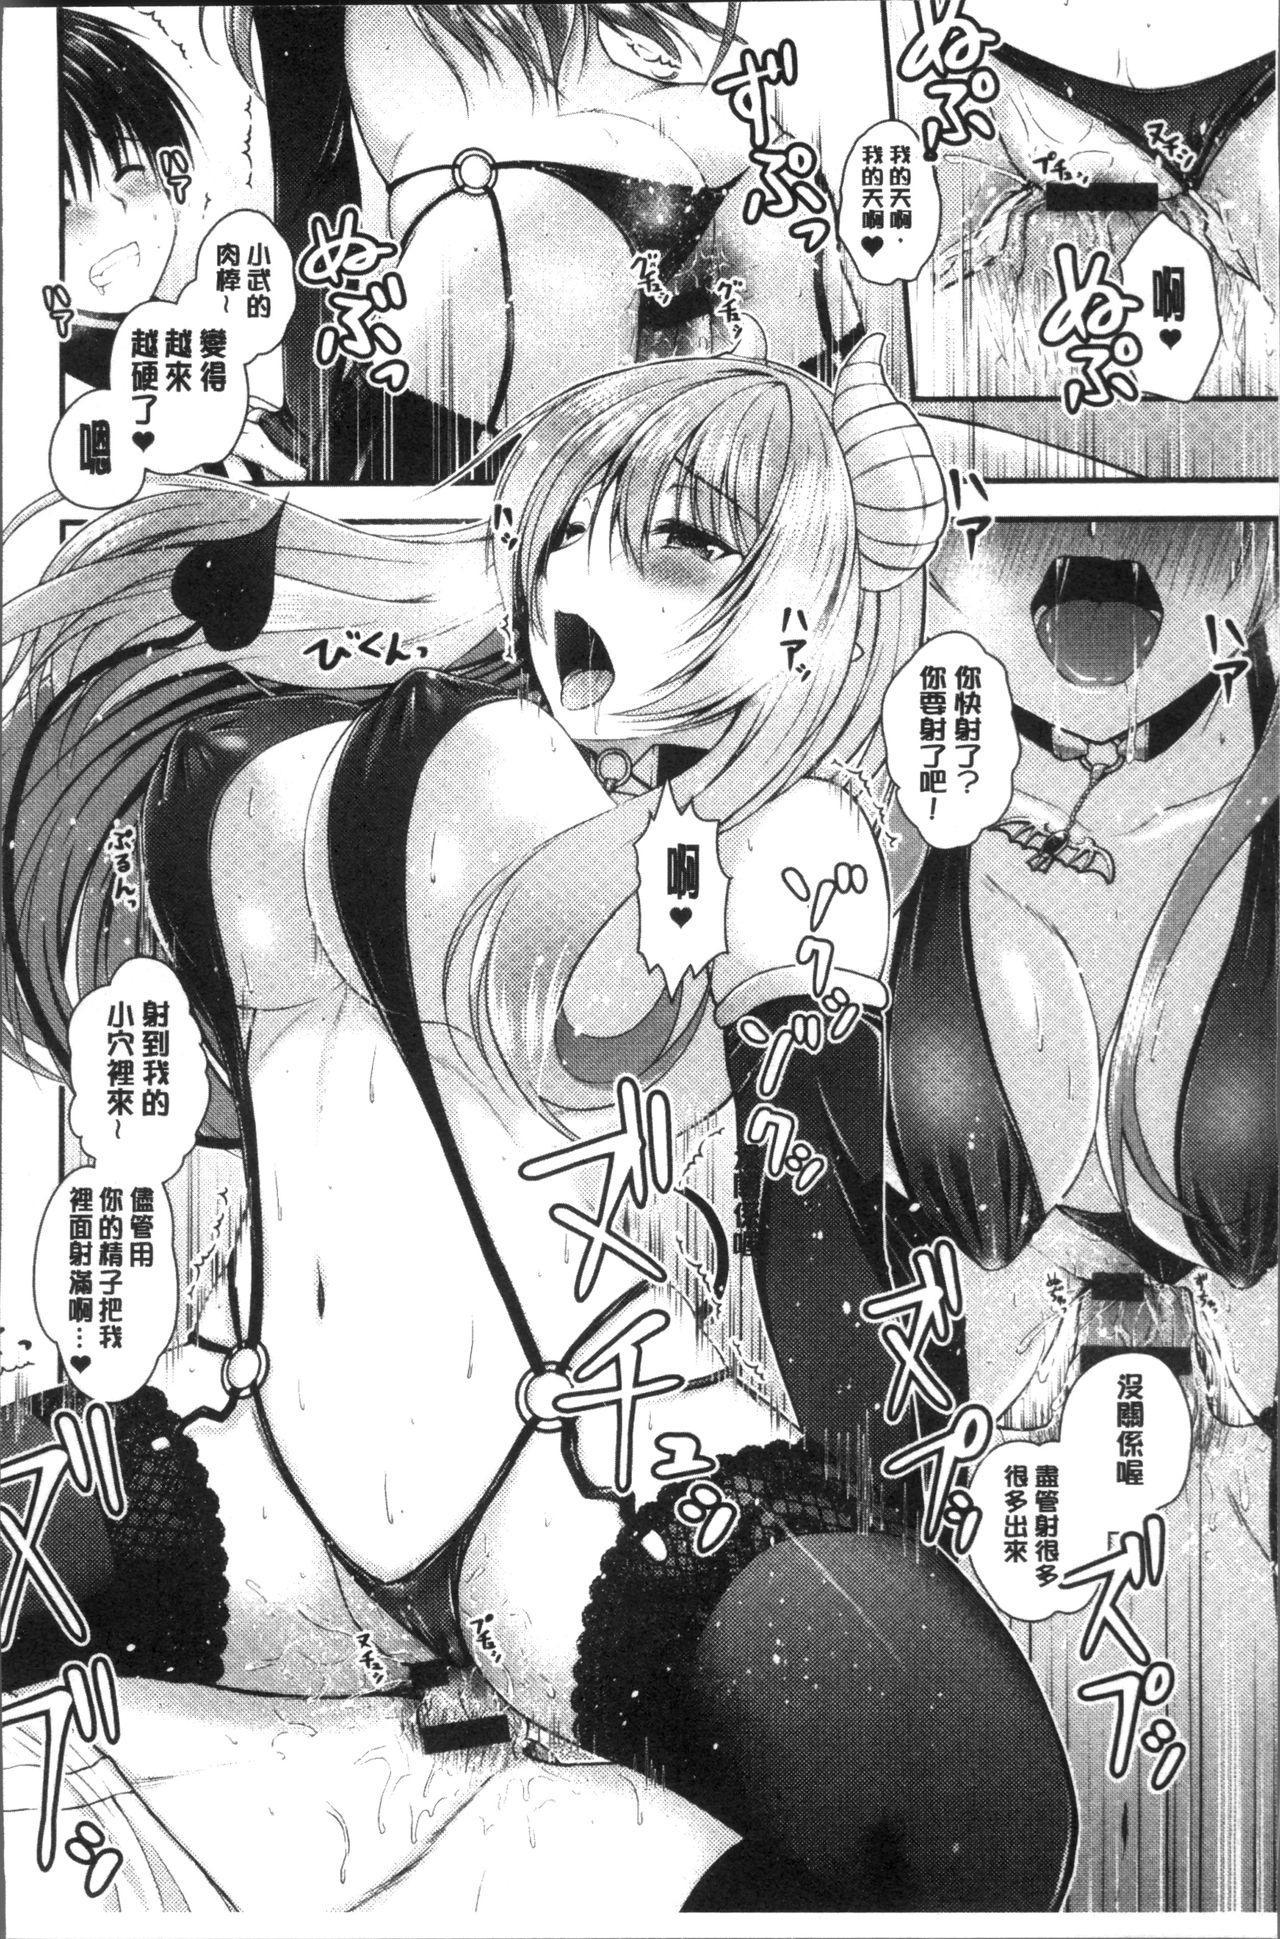 Moteasobitsukushi | 調戲挑逗的大全集 117